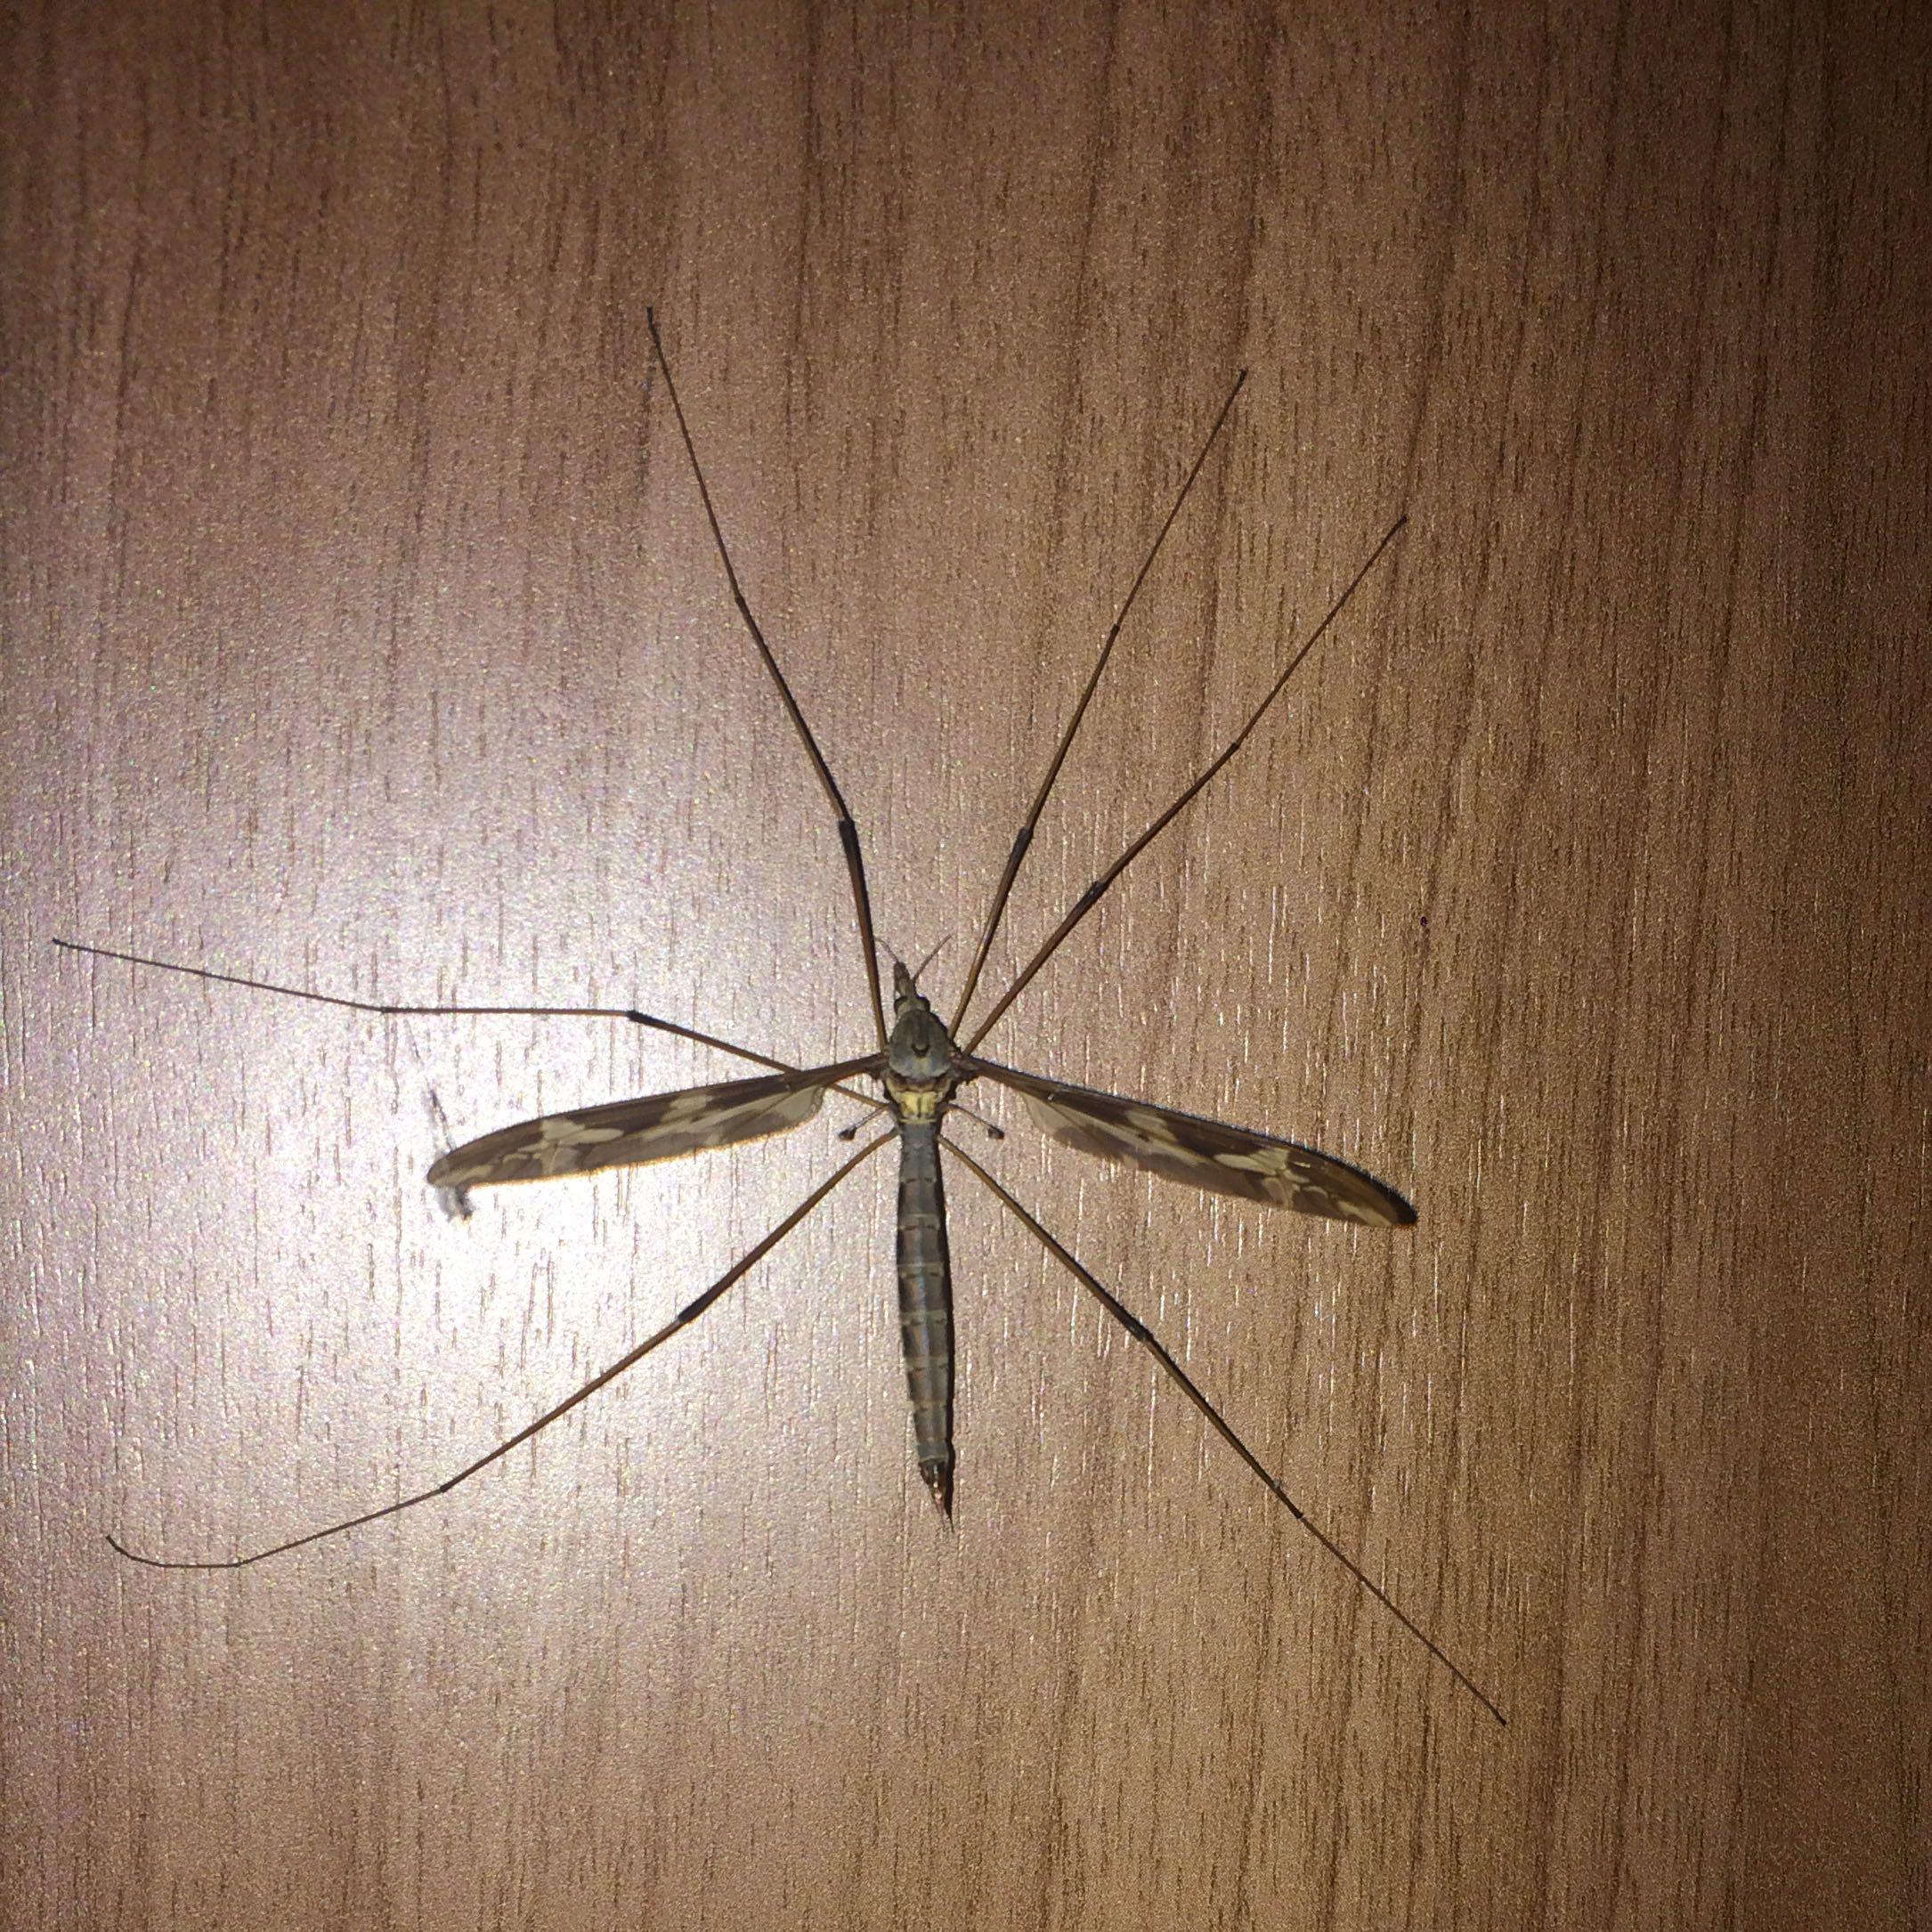 Große Mücken